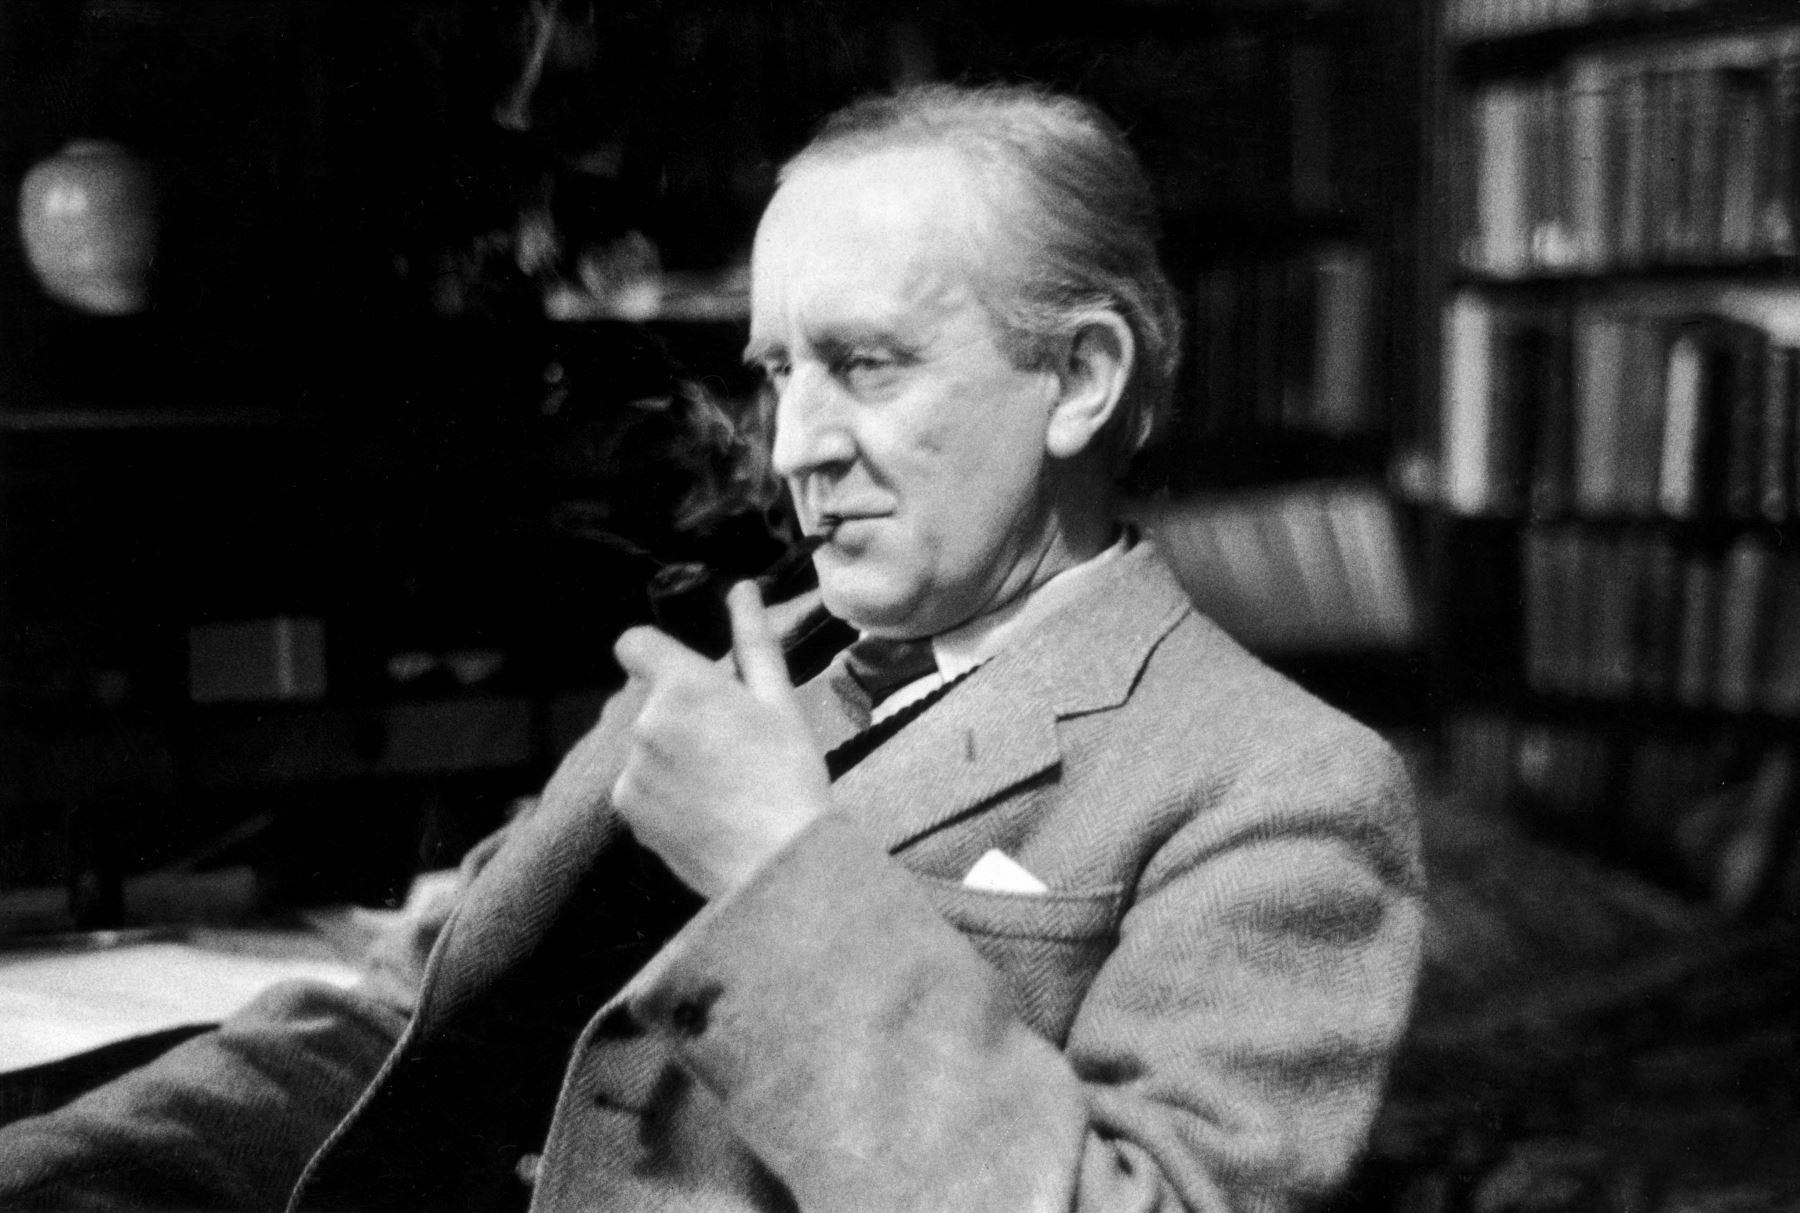 Escritor John Reuel Tolkien. INTERNET/Medios